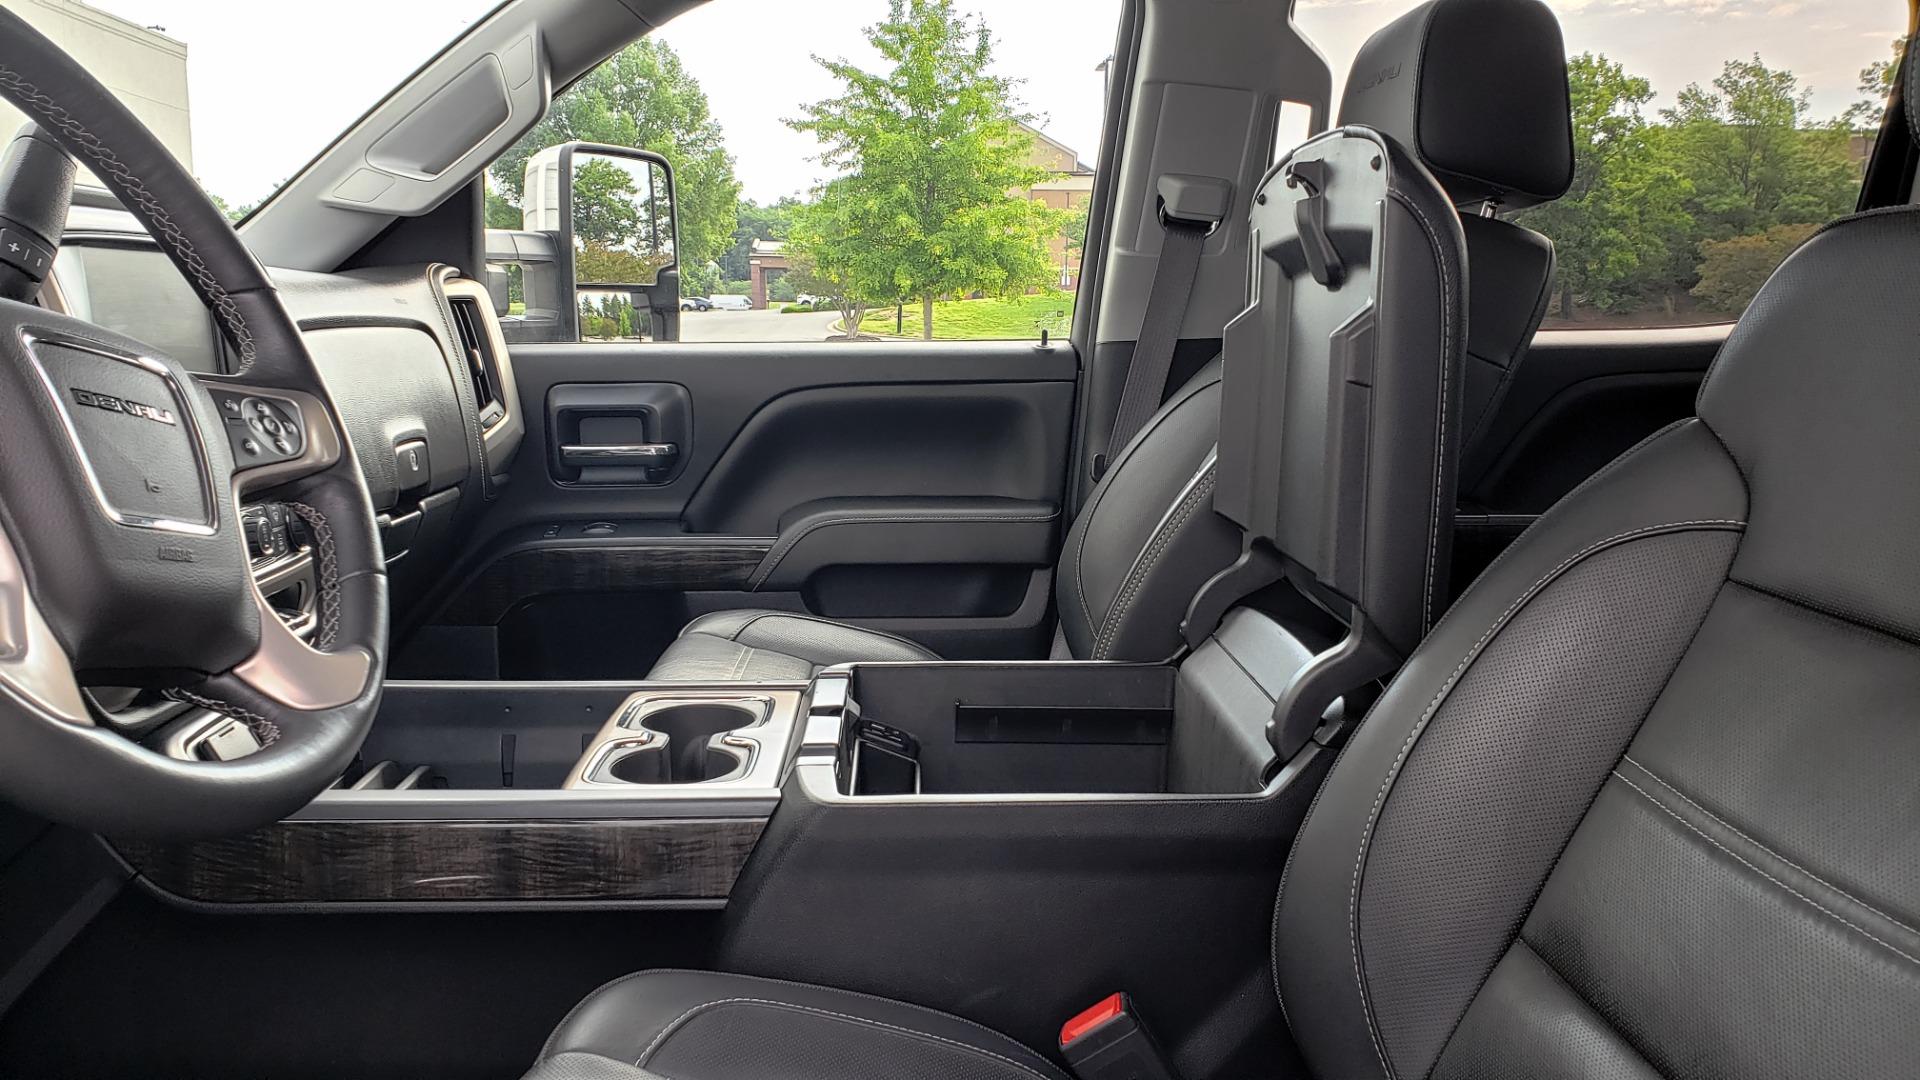 Used 2015 GMC SIERRA 2500HD DENALI / WIFI / NAV / DURAMAX PLUS / DRVR ALERT / SUNROOF / REARVIEW for sale $56,995 at Formula Imports in Charlotte NC 28227 51